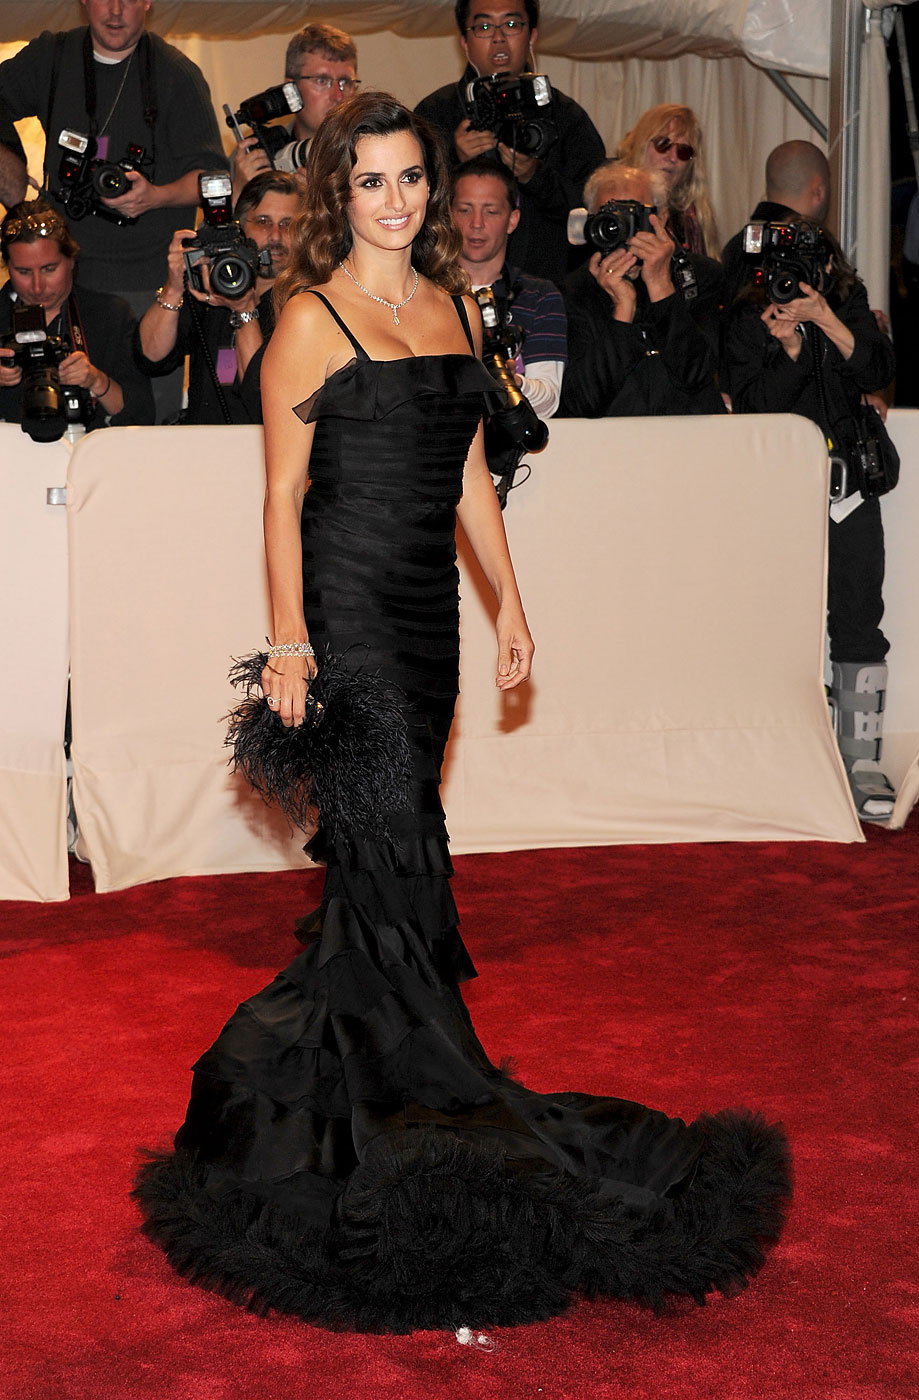 Penelope Cruz wears Oscar de la Renta to the  Alexander McQueen: Savage Beauty  Costume Institute Gala at The Metropolitan Museum of Art on May 2, 2011 in New York City.